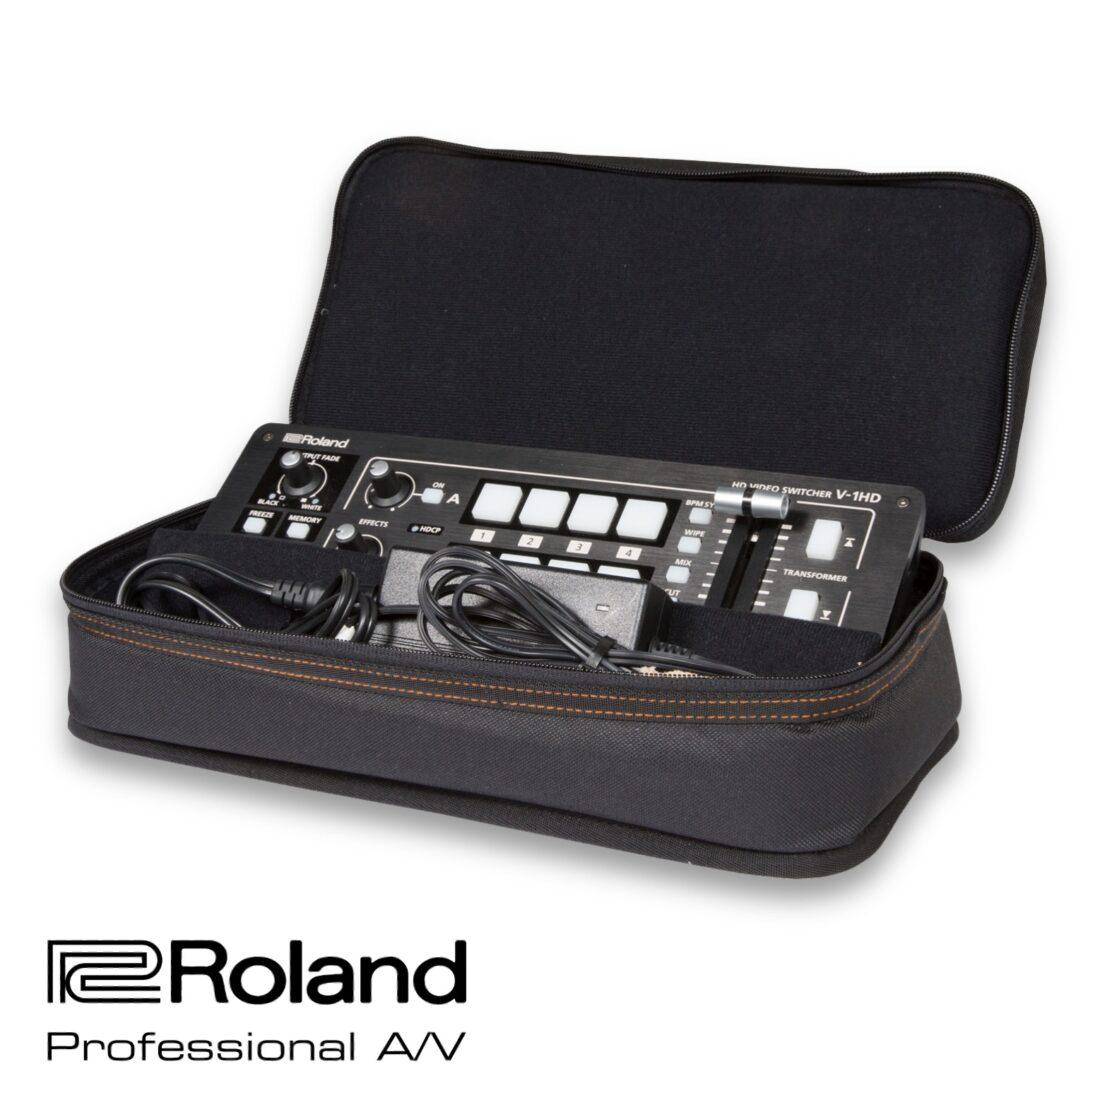 Roland CB-BV1 open